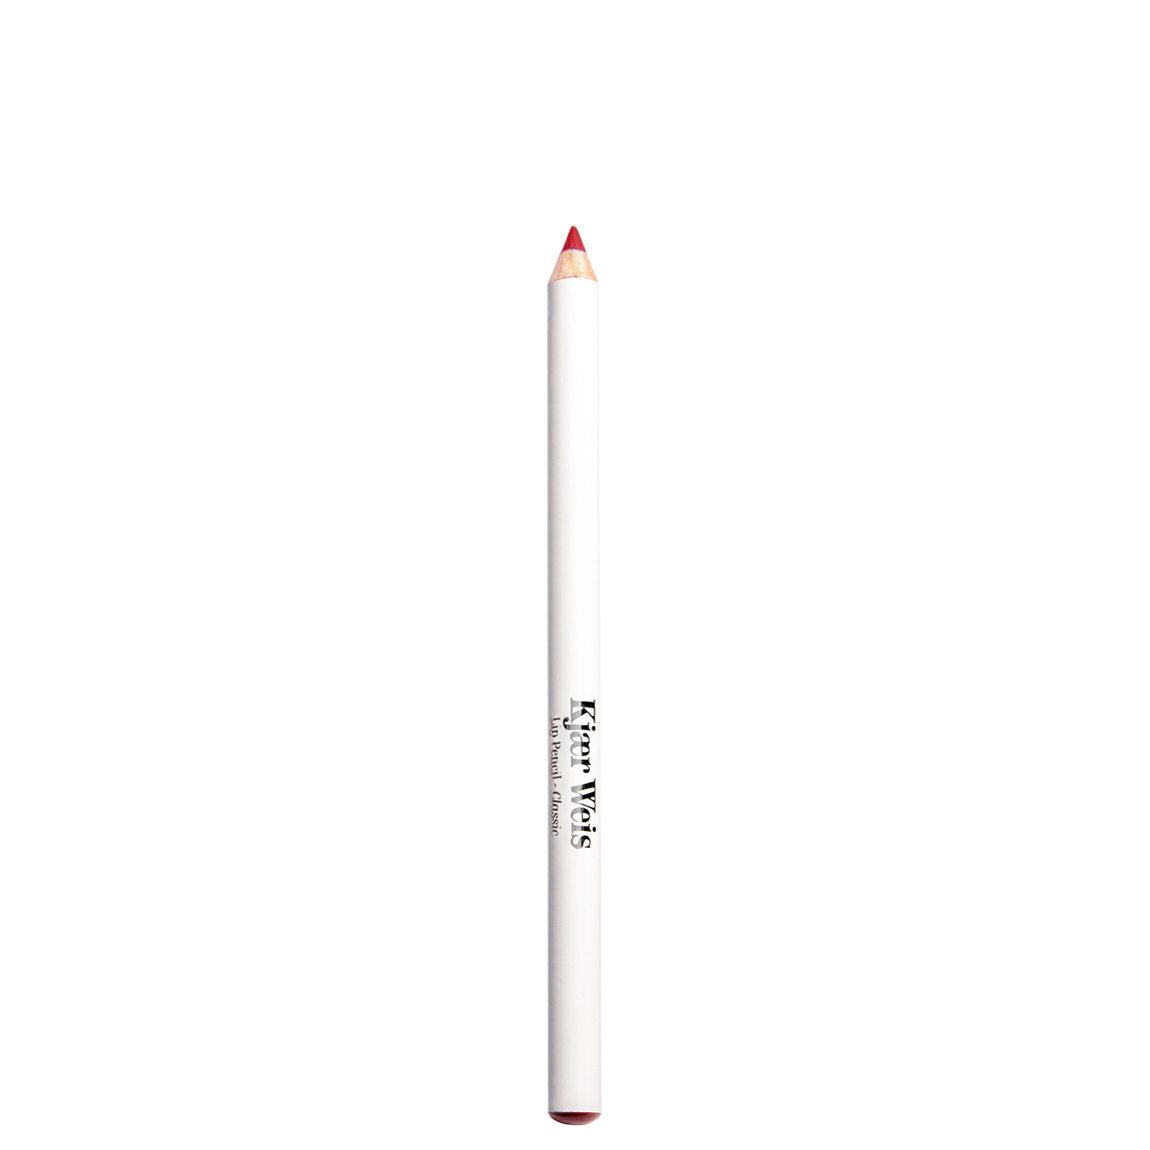 Kjaer Weis Lip Pencil Classic alternative view 1.